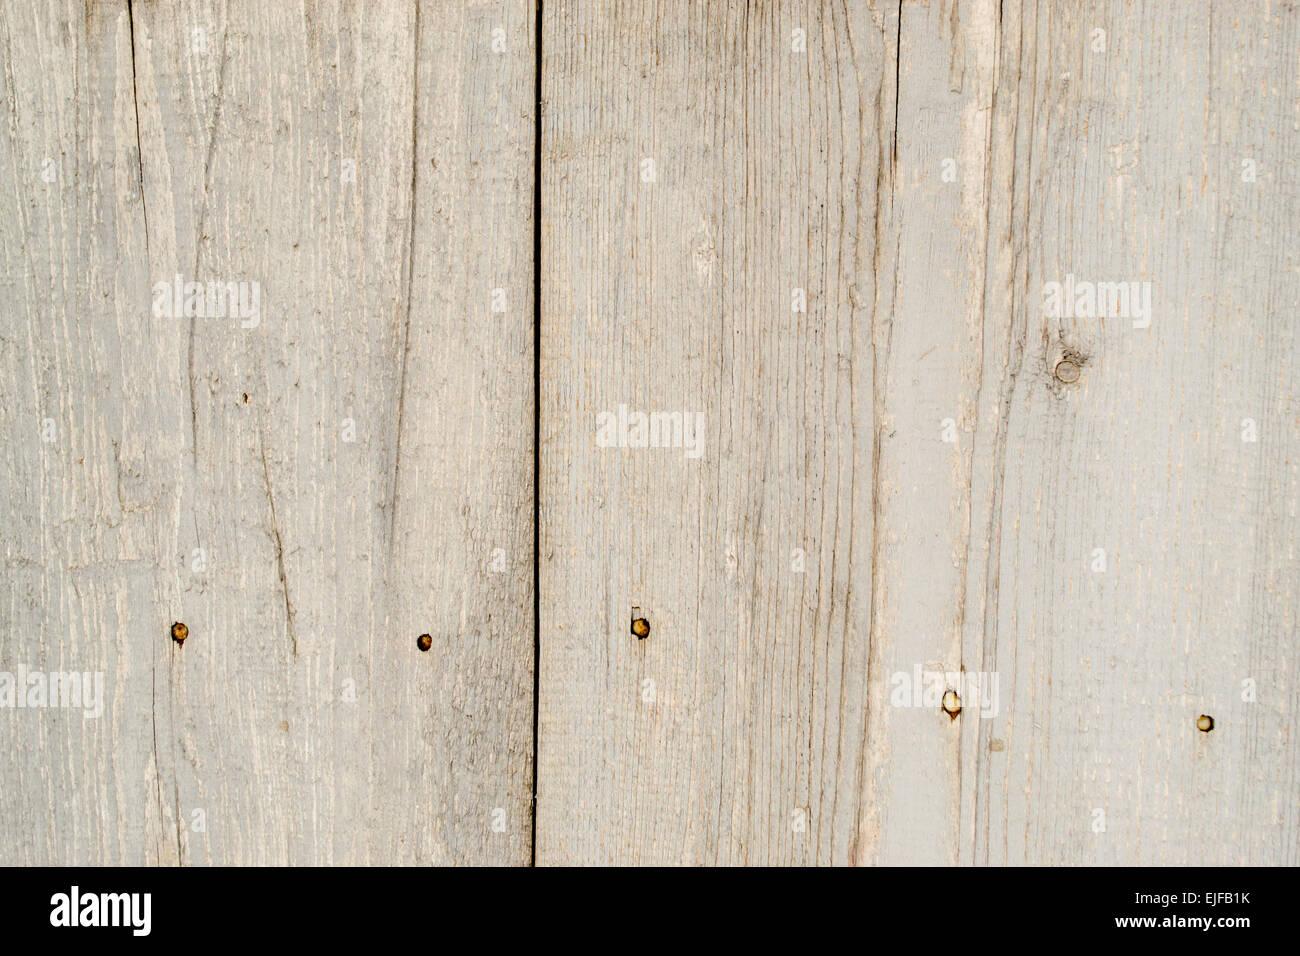 antik holz detail mit keine farbe wie treibholz altern with antik holz